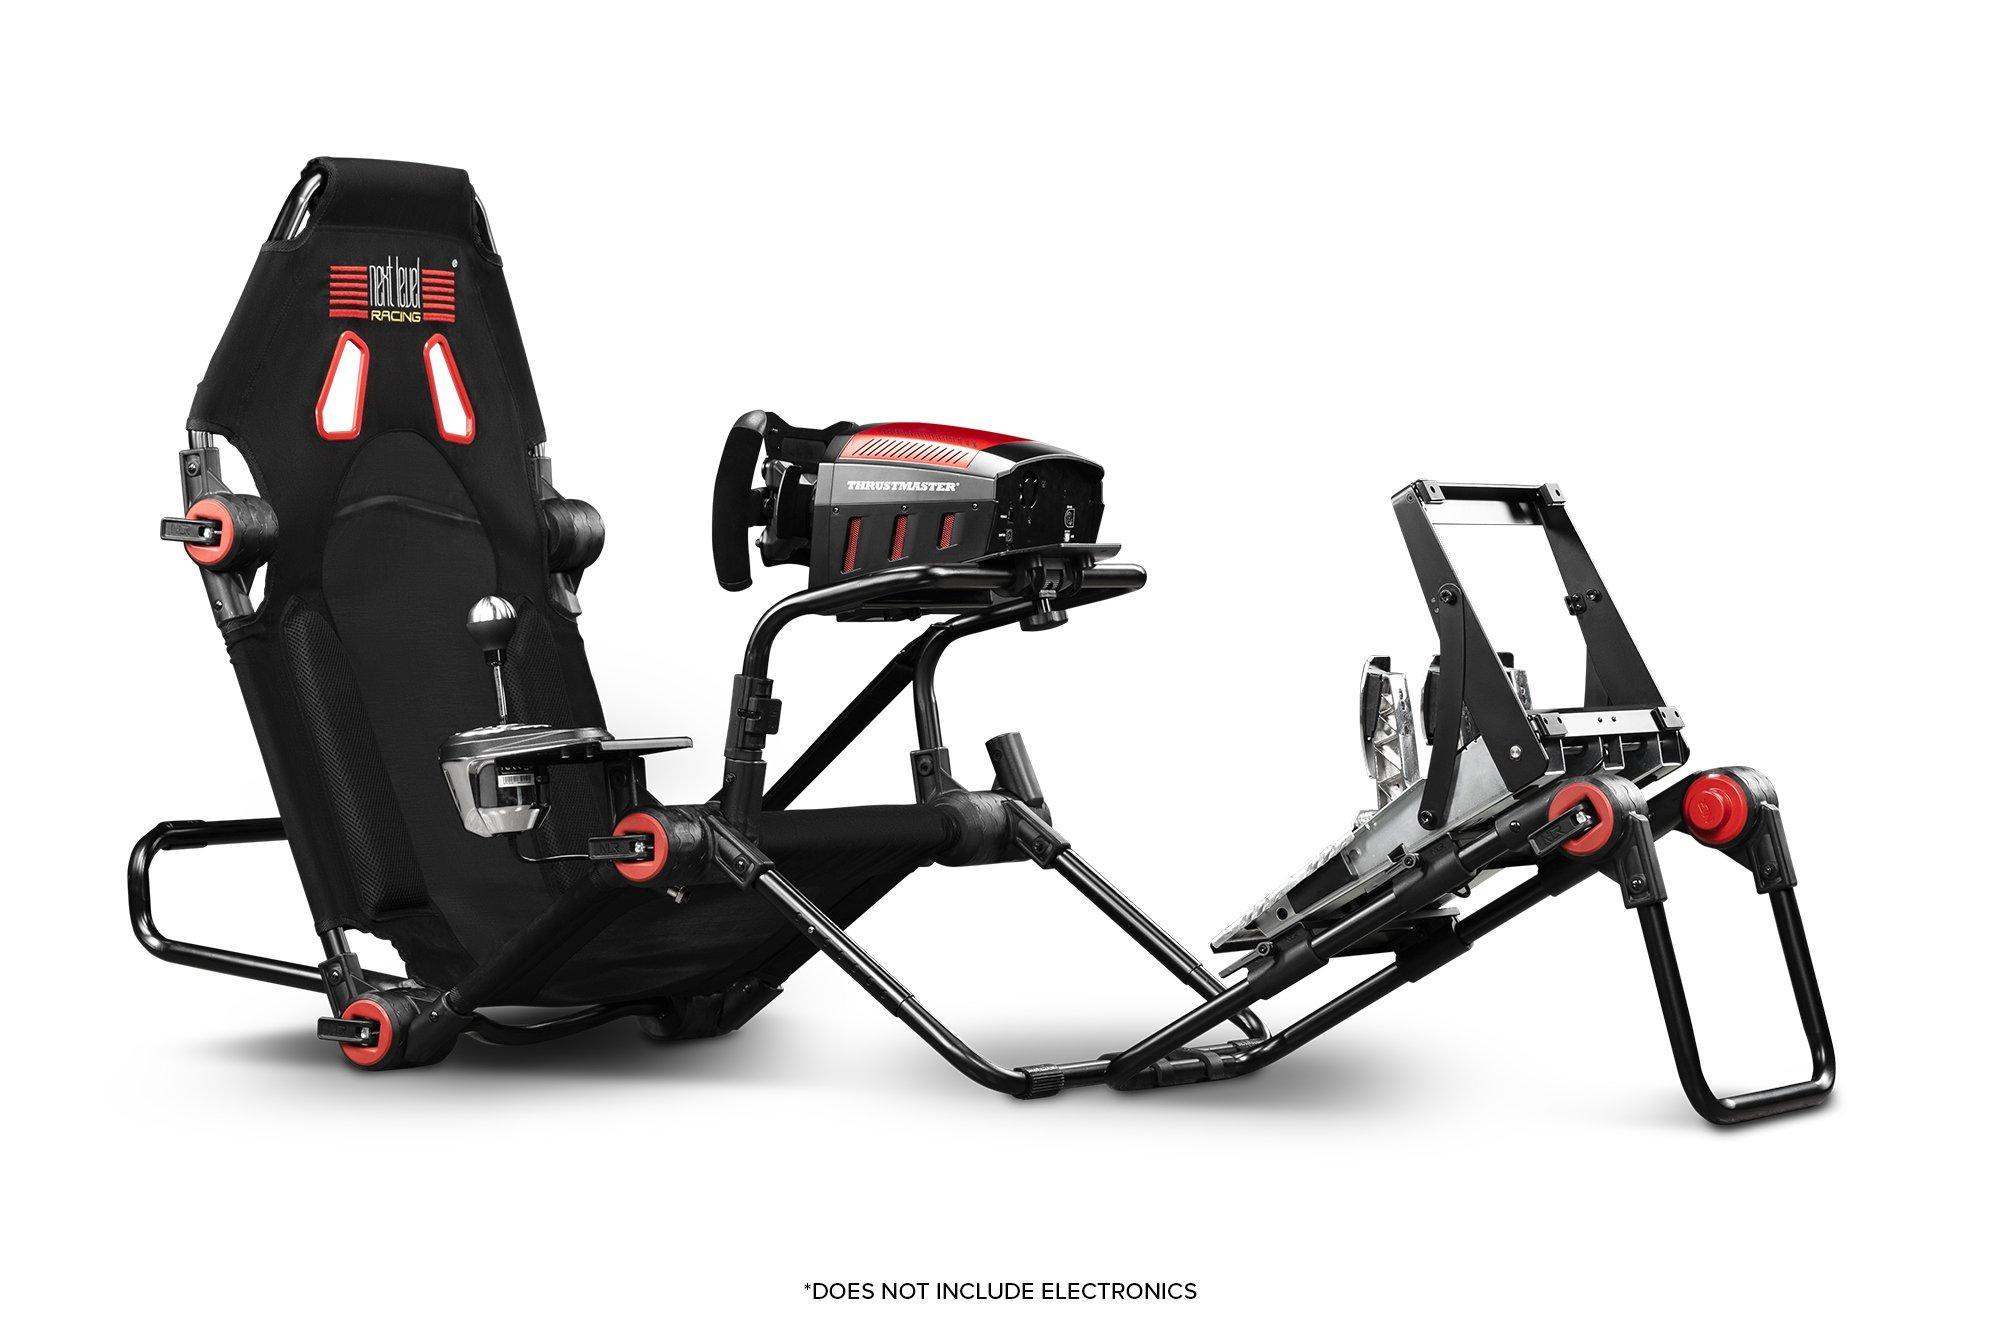 Deals on Next Level Racing F-GT Lite Black Simulator Cockpit